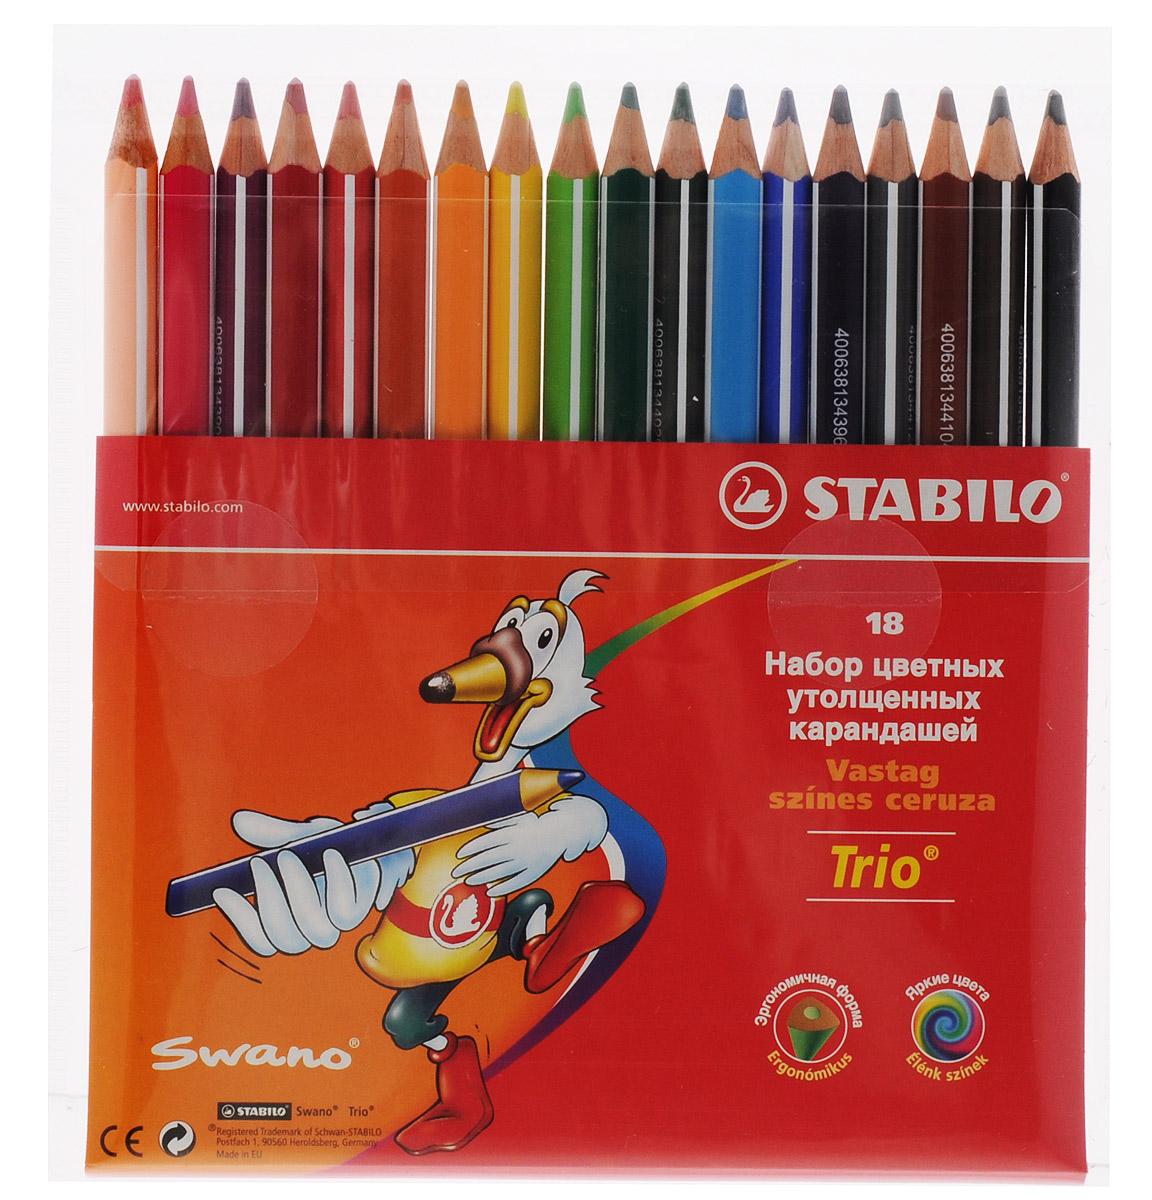 Stabilo Цветные карандаши Trio 18 цветов -  Карандаши